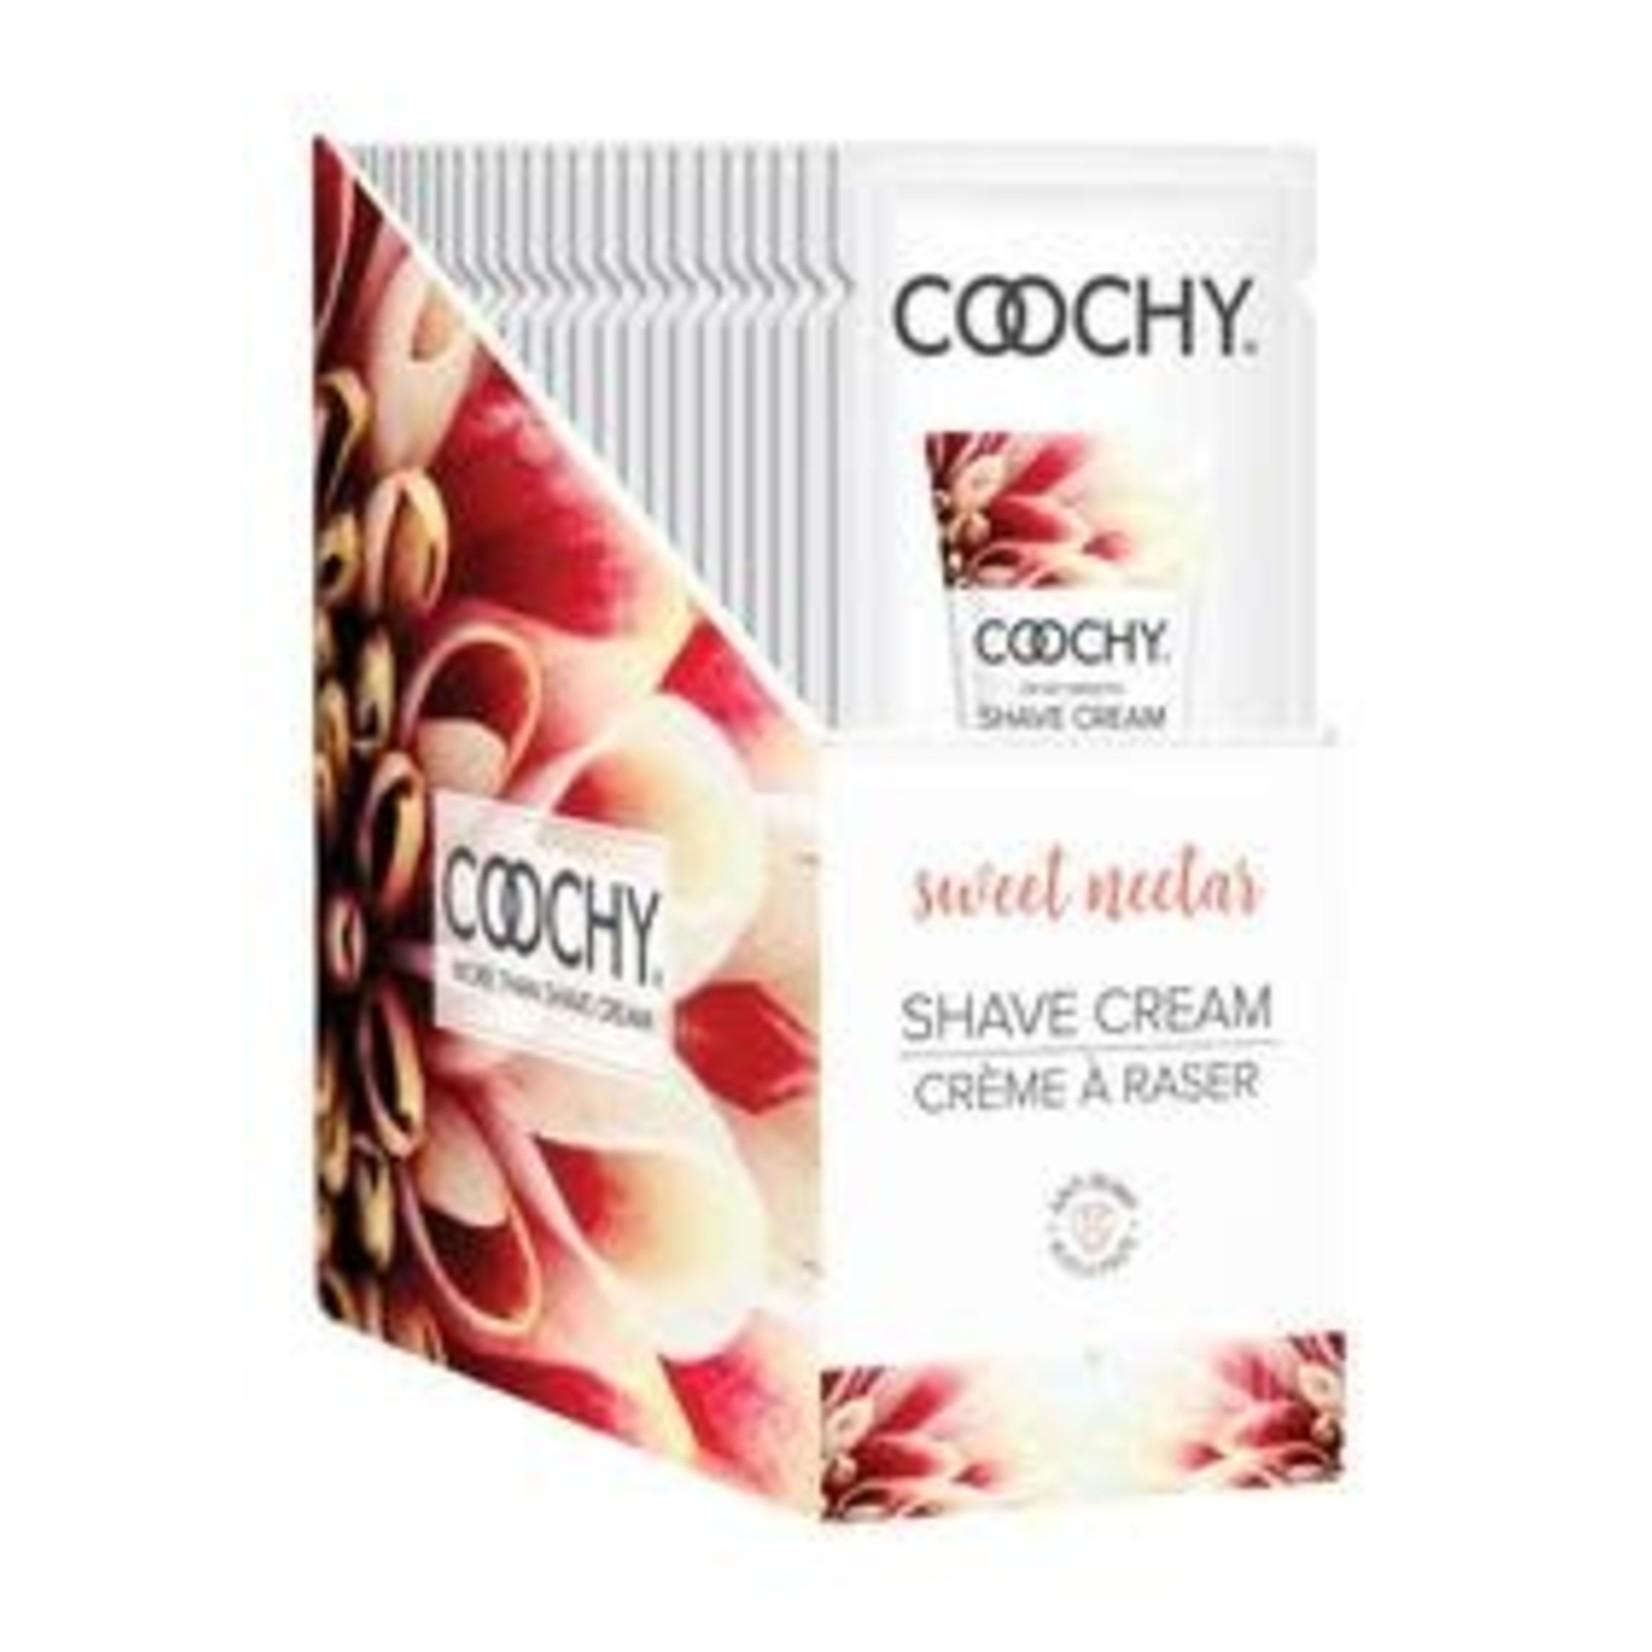 Coochy Shave Cream-Sweet Nectar 15ml Foil